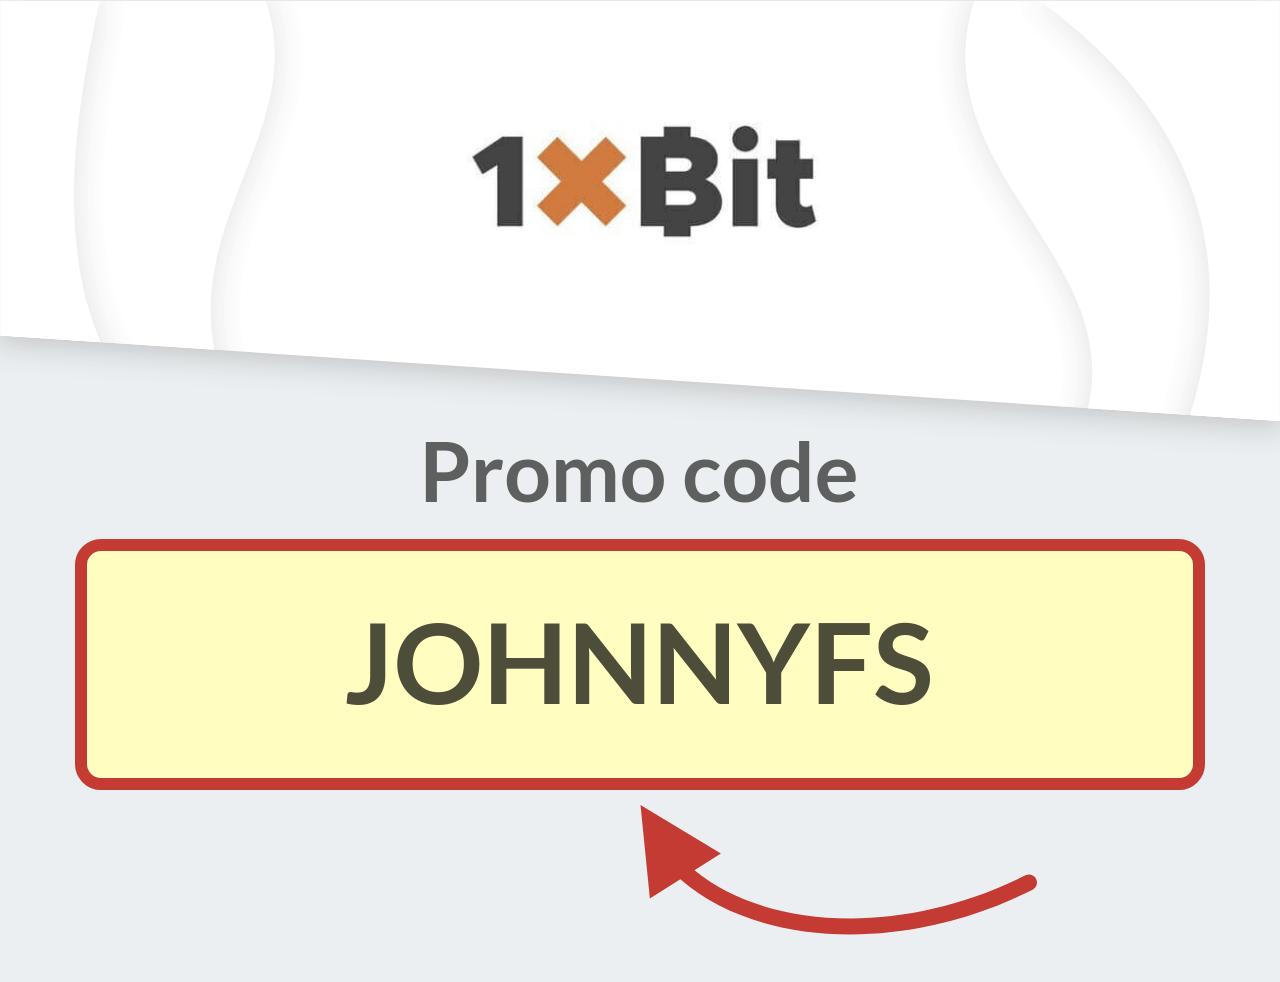 1XBIT Promóciós kód - VIP bónusz: 7 BTC | JOHNNYFS